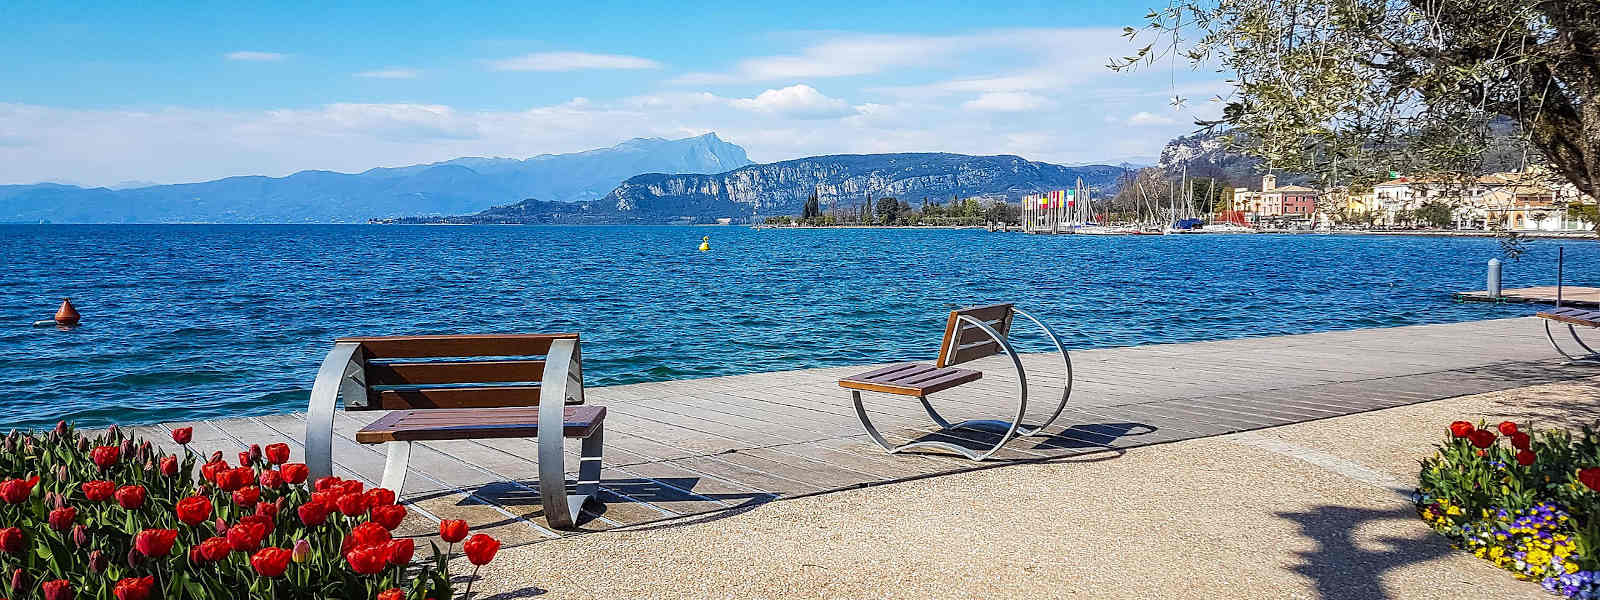 Apartments Lake Garda sale guaranteed rental income 3% net